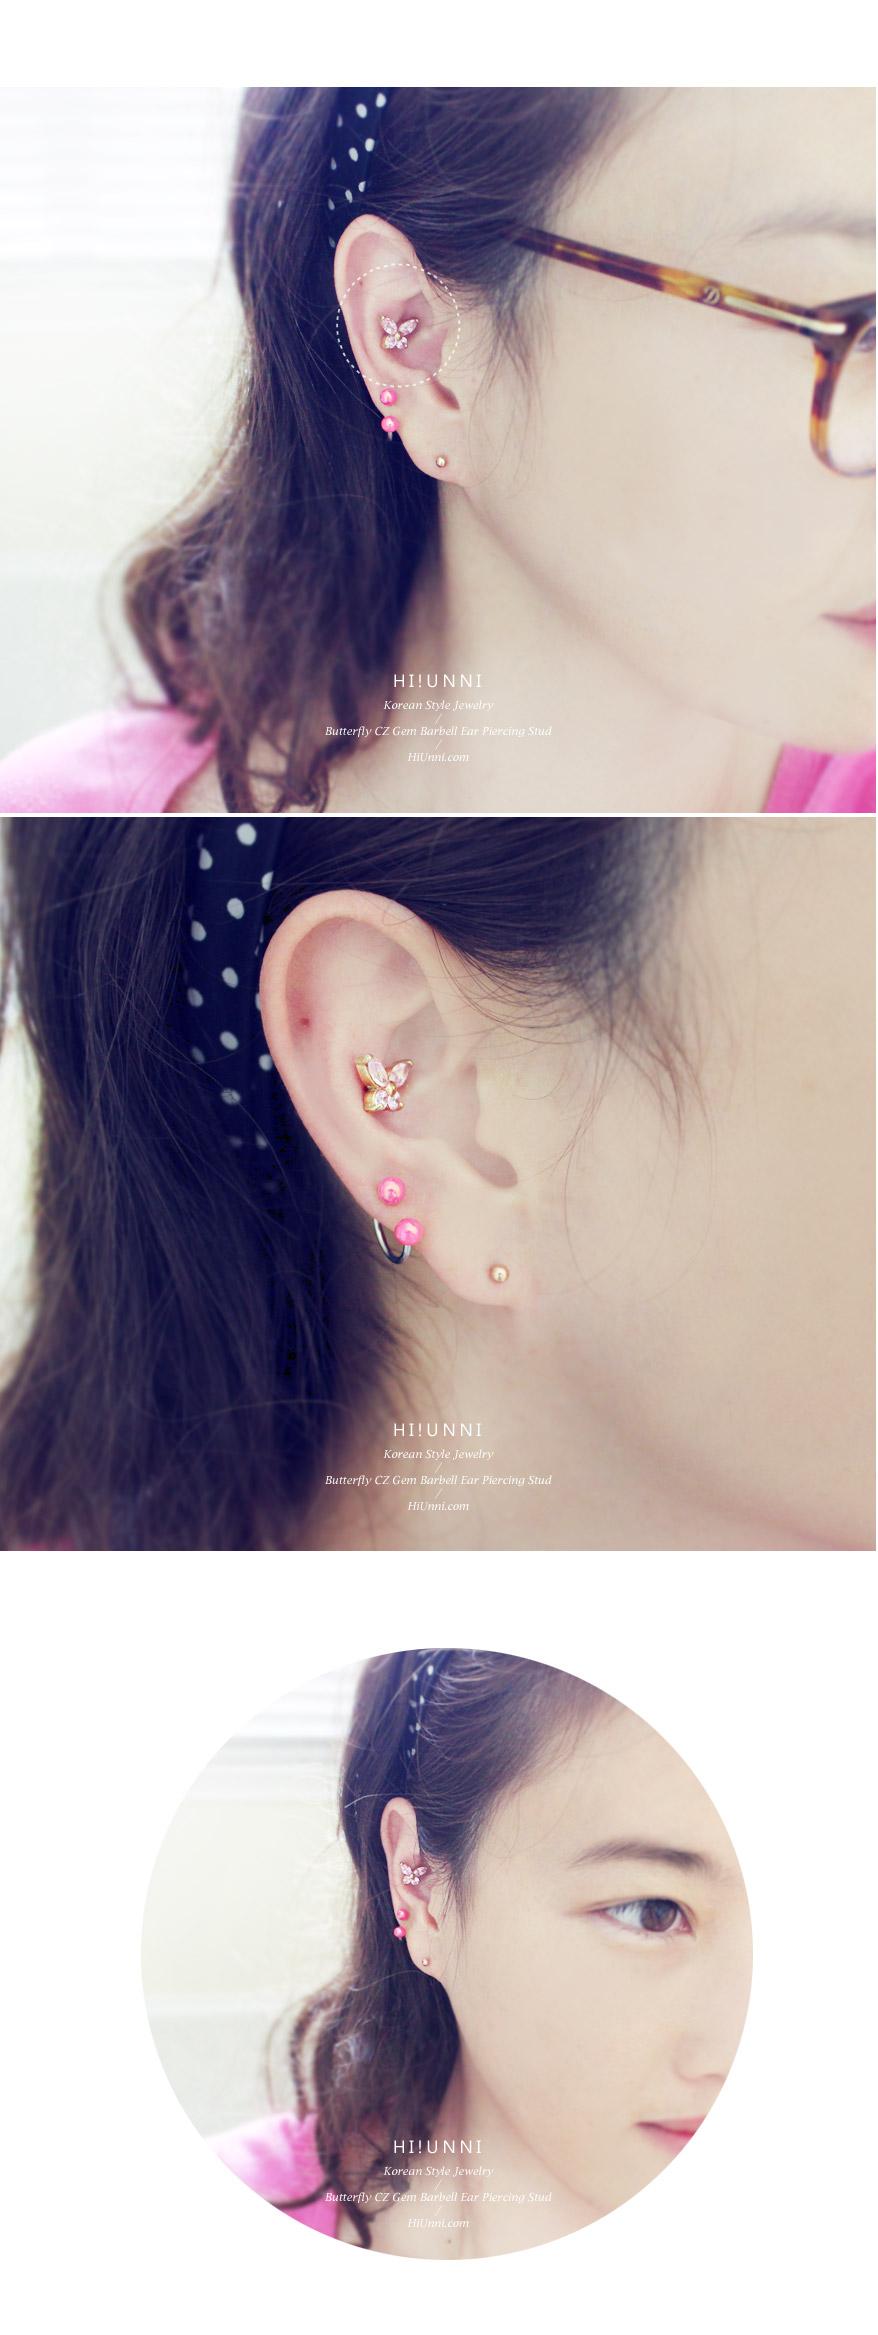 ear_studs_piercing_Cartilage_16g_316l_Stainless_Steel_earring_korean_asian_style_barbell_Butterfly_gem_cubic_cz_3